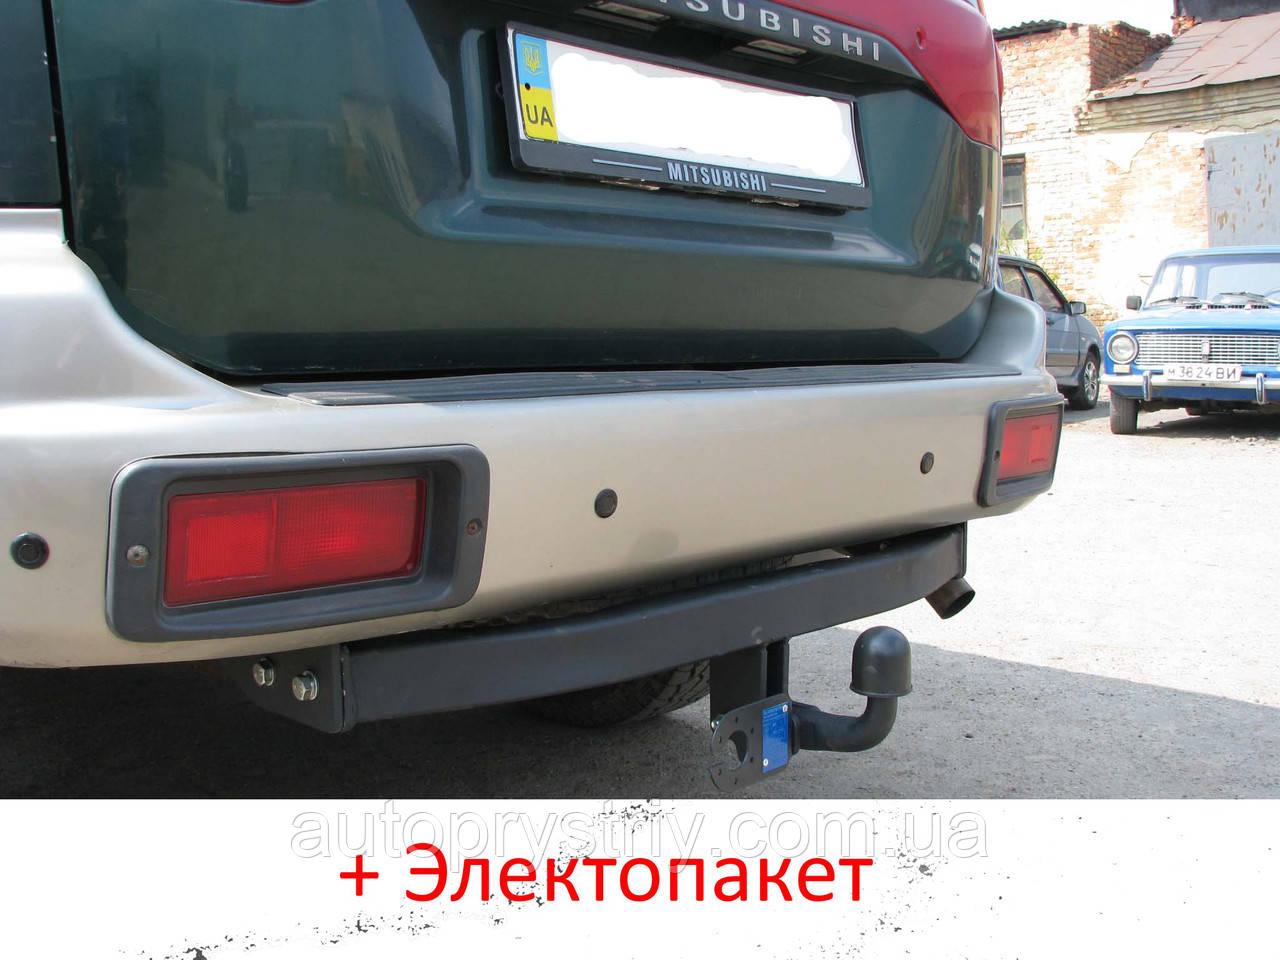 Фаркоп - Mitsubishi Pajero Sport Внедорожник (1998-2009)